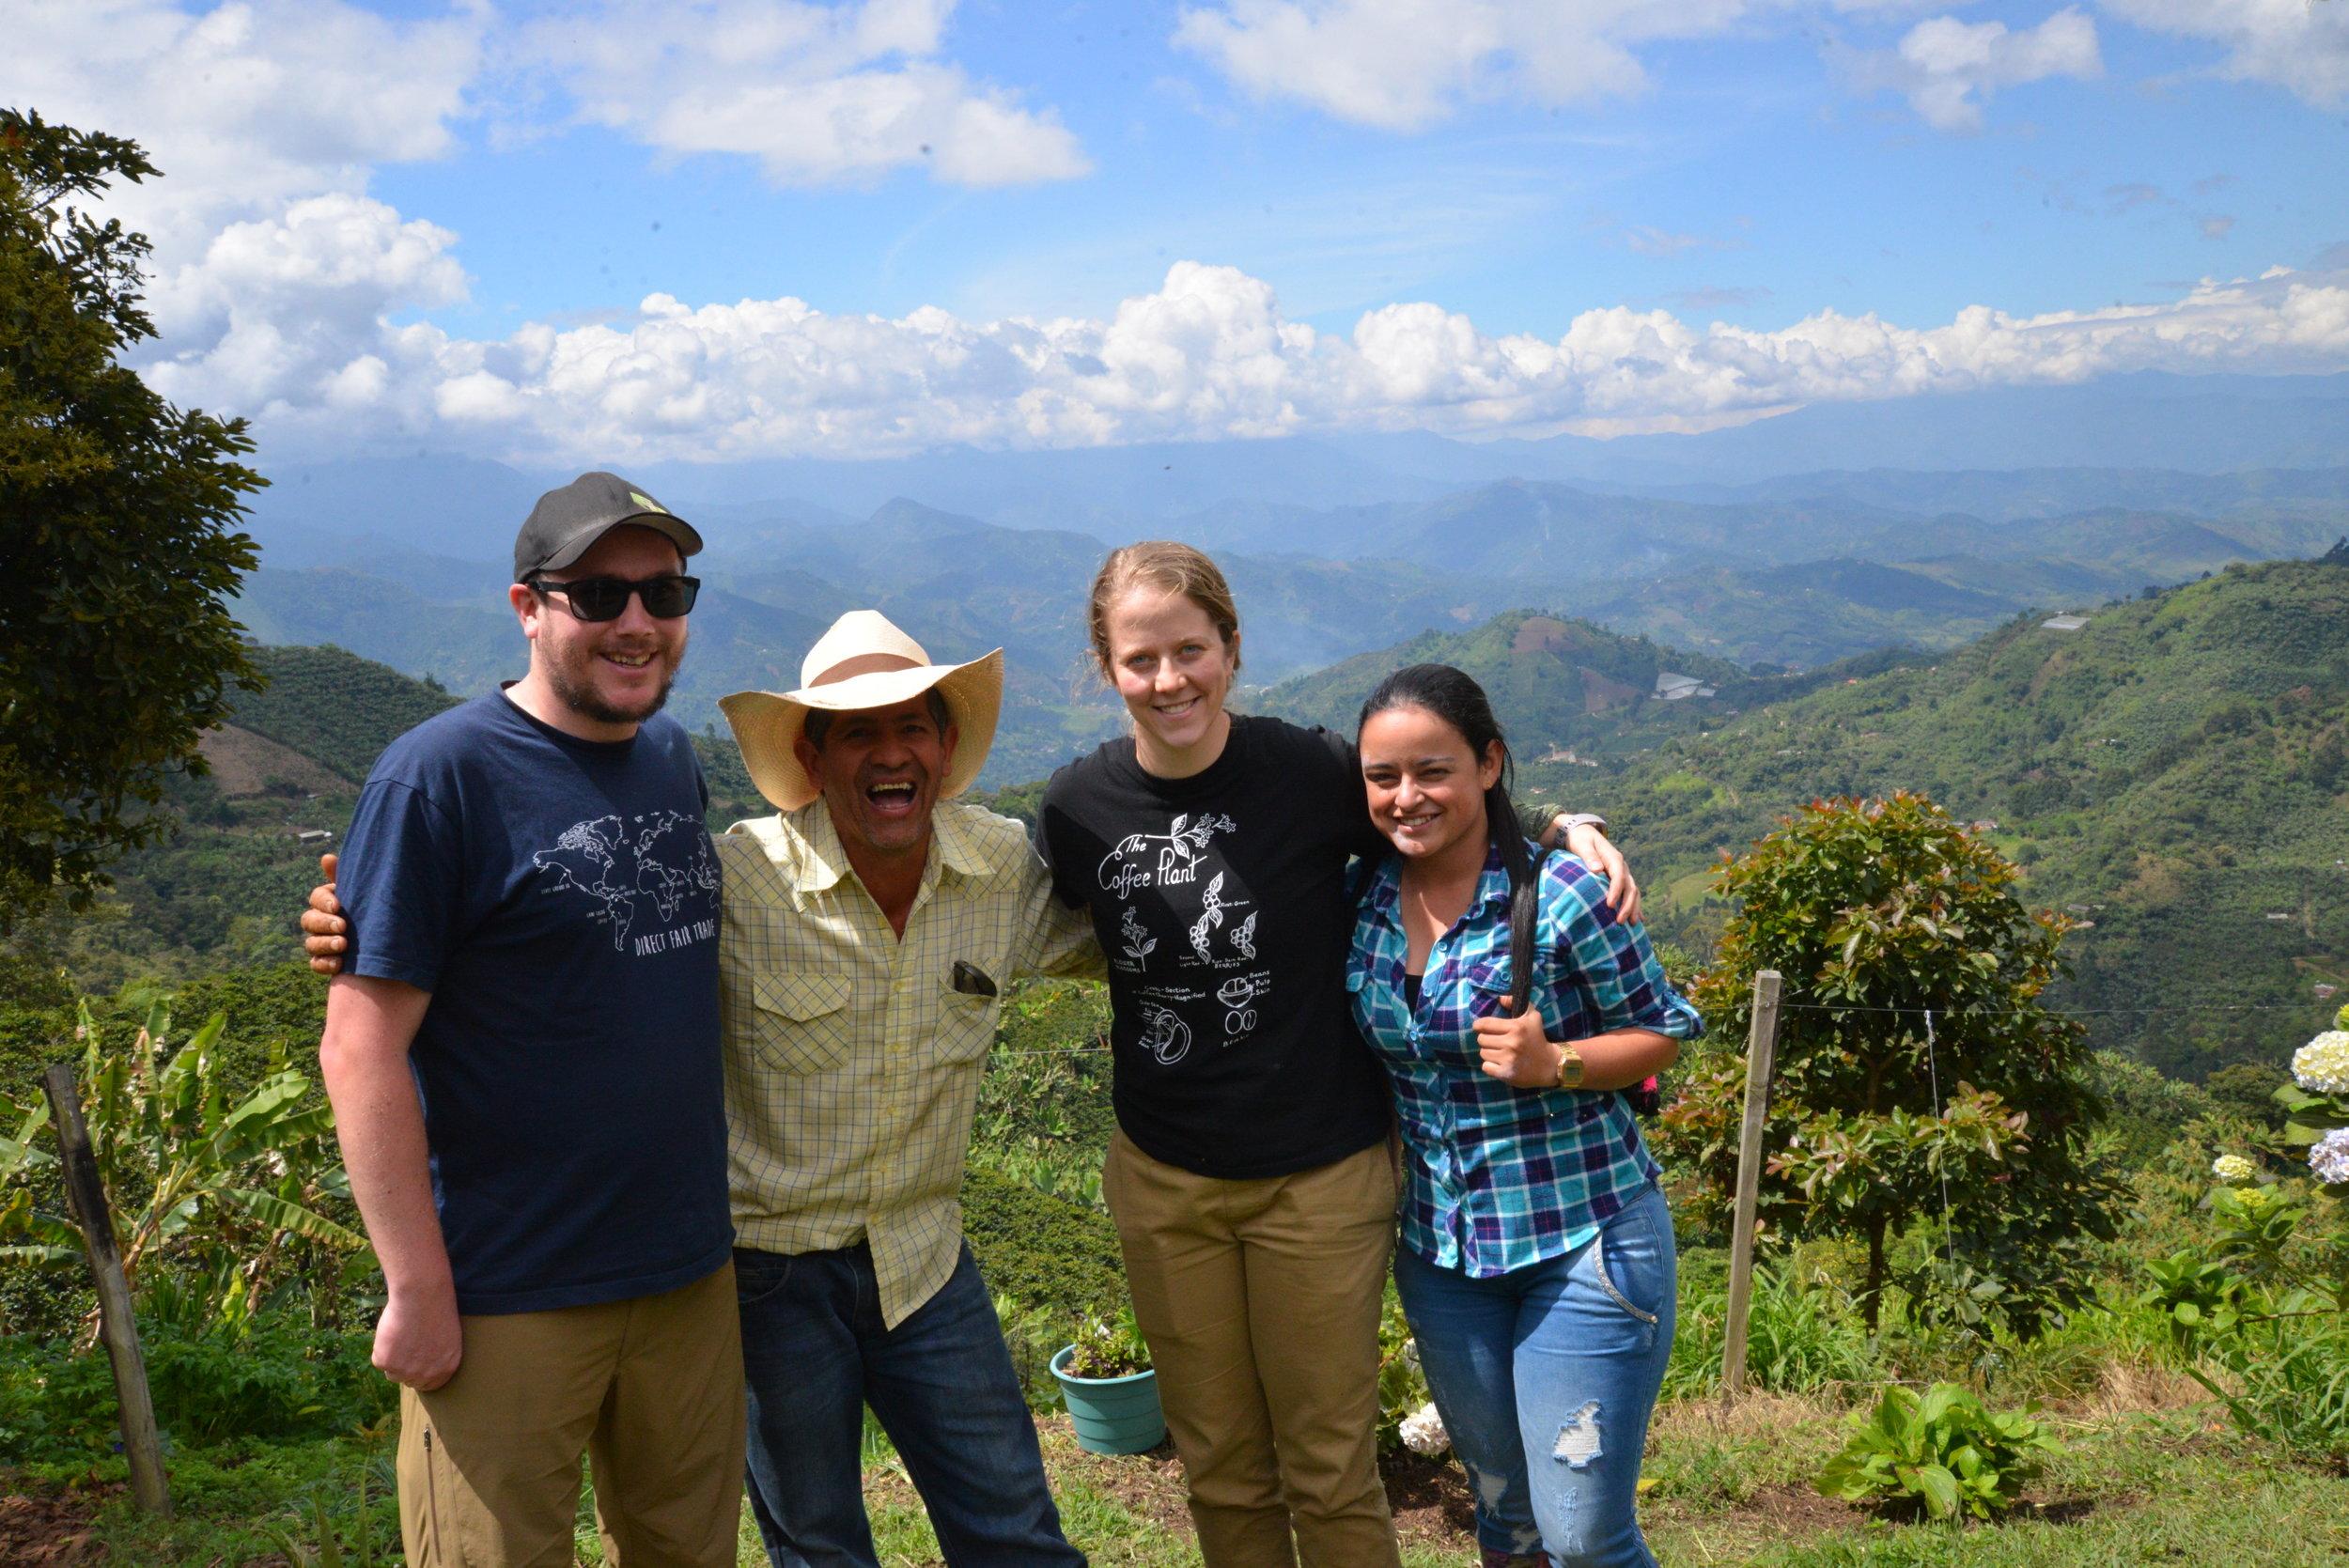 Dave (Level Ground), Jaime, Robyn (Level Ground), and Elizabeth (Famicafé) visit at Jaime's farm.